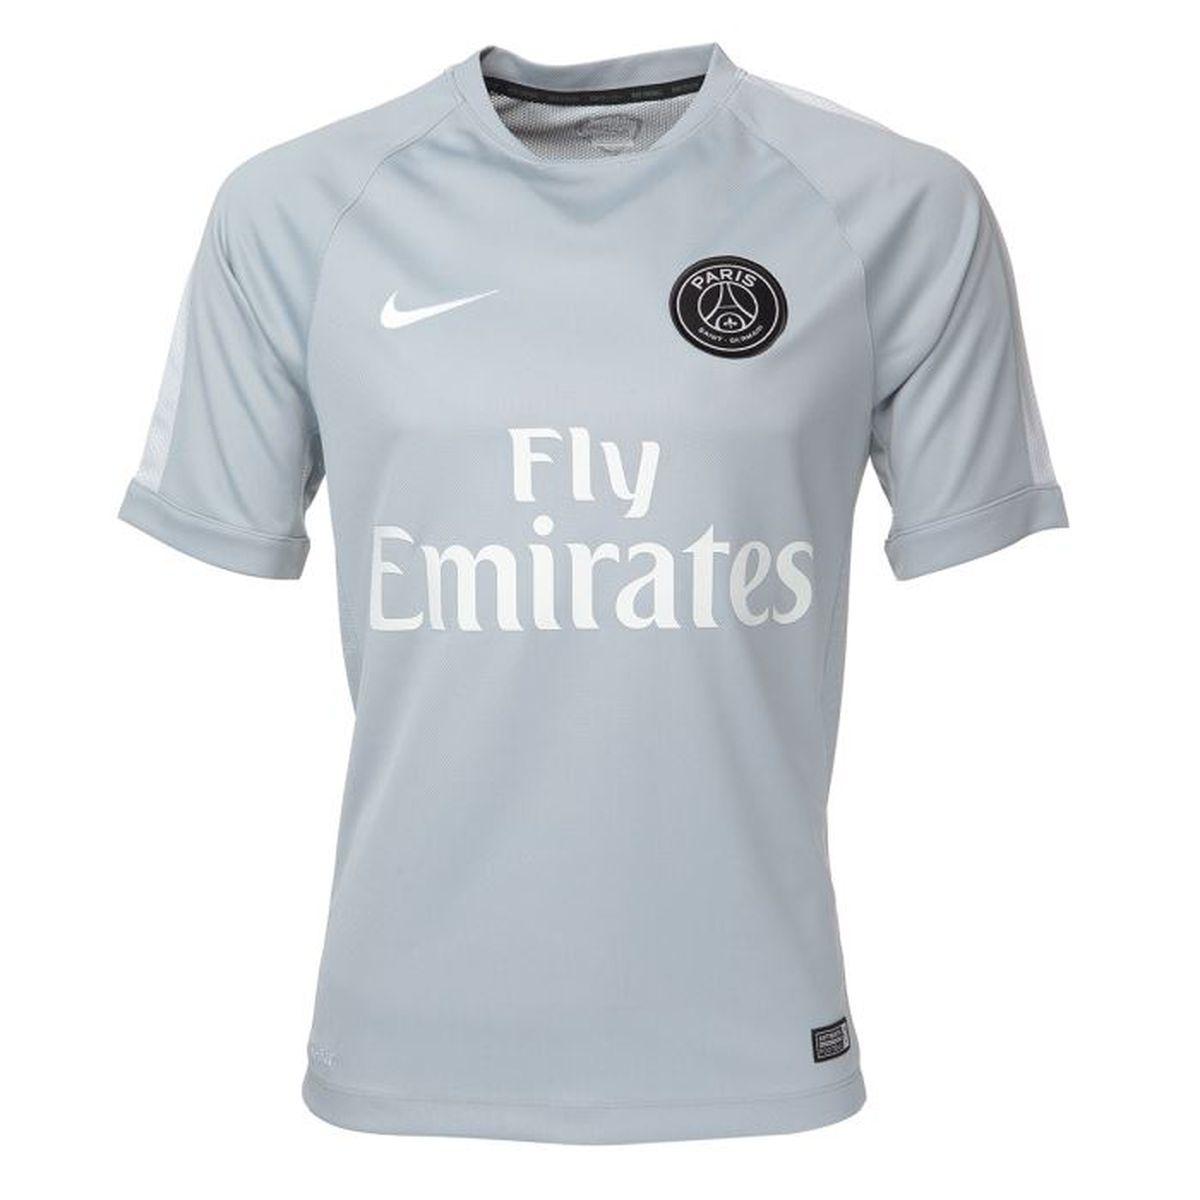 NIKE Maillot Football Entrainement PSG Homme Prix pas cher